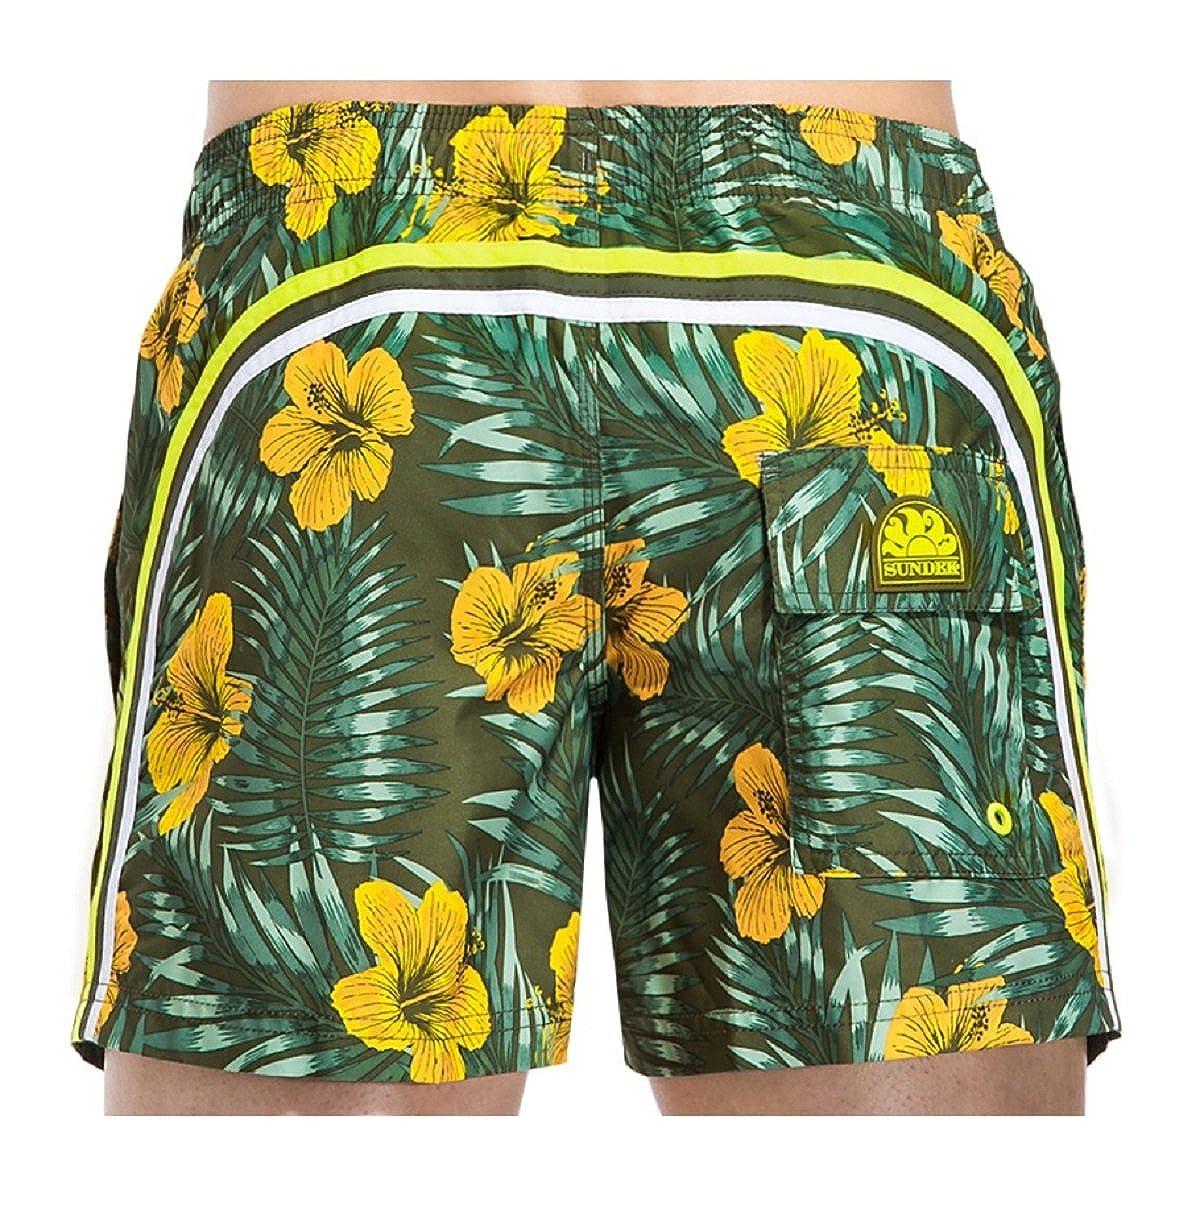 68071c0e71 Costume Sundek m504bdpbdpo1cf 302 elastic waist 14 ar green medio ss17:  Amazon.co.uk: Clothing